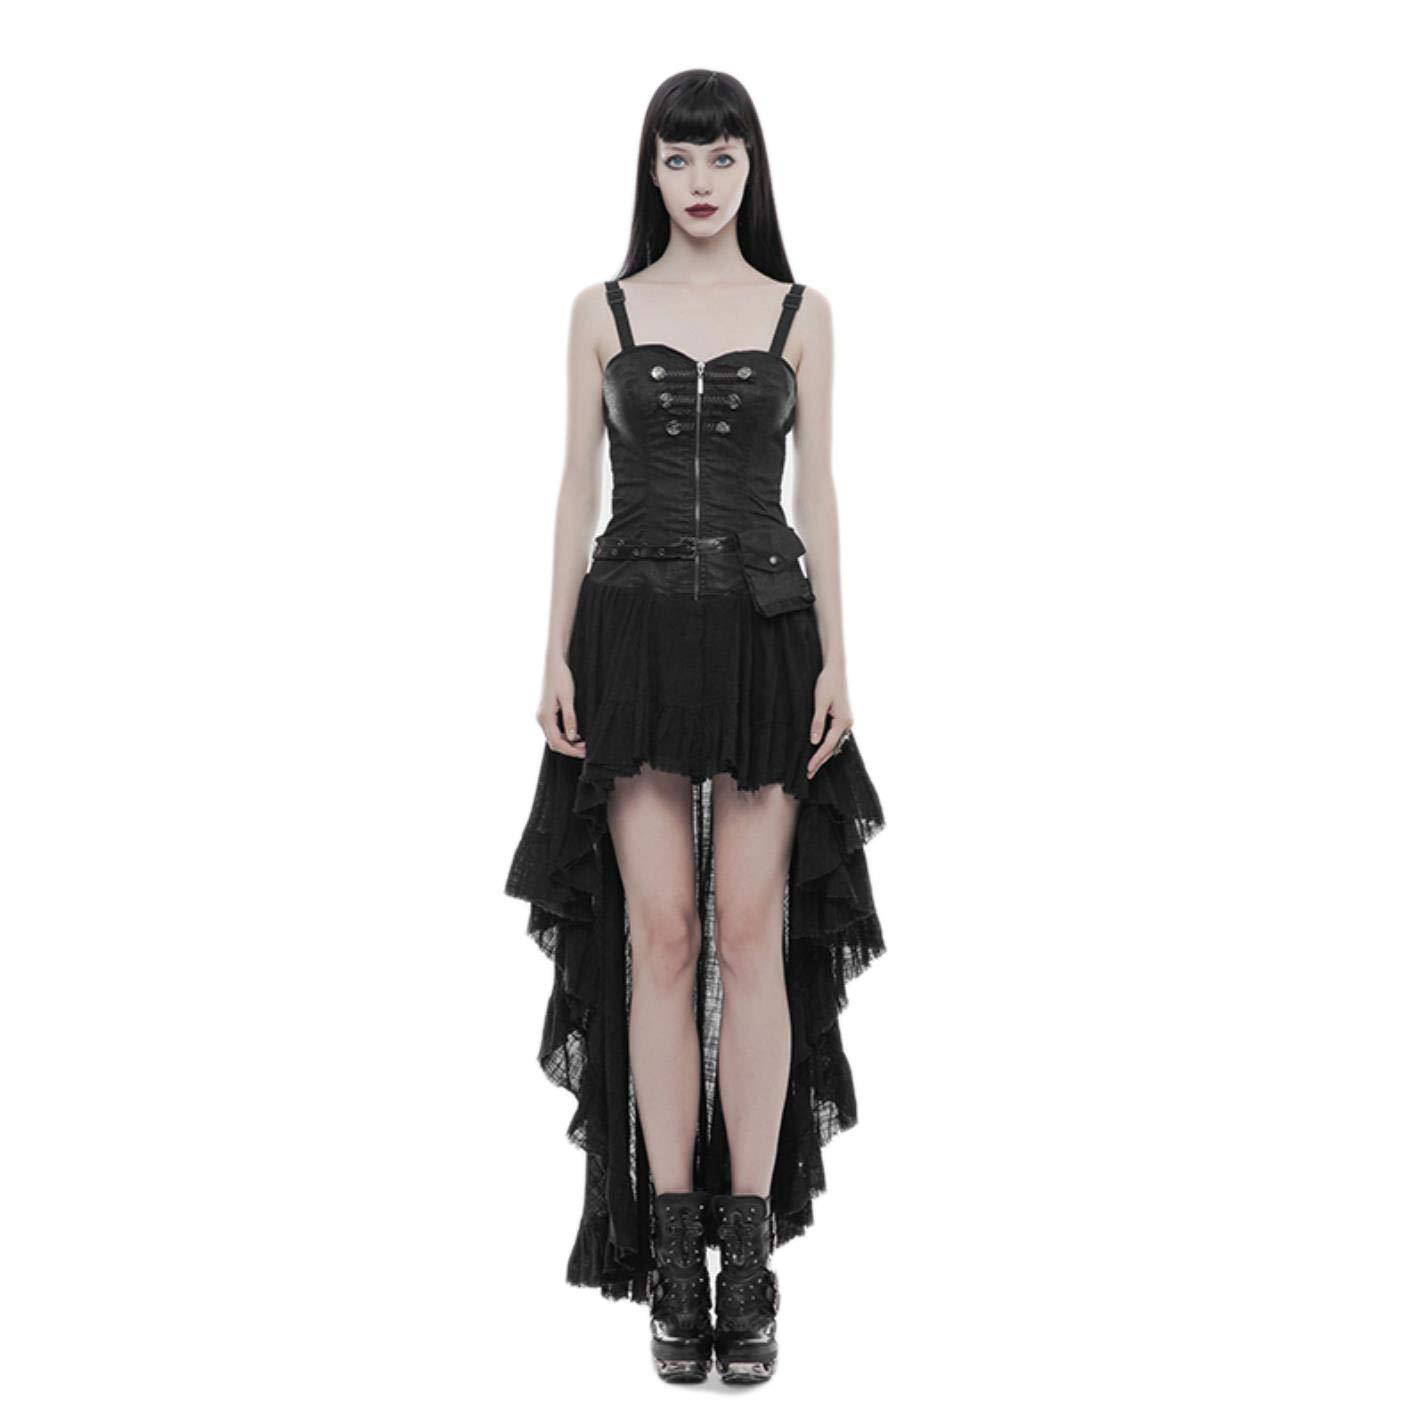 Steampunk Retro Strapless Tube Top Chest-type Asymmetric Hem Lace Dress